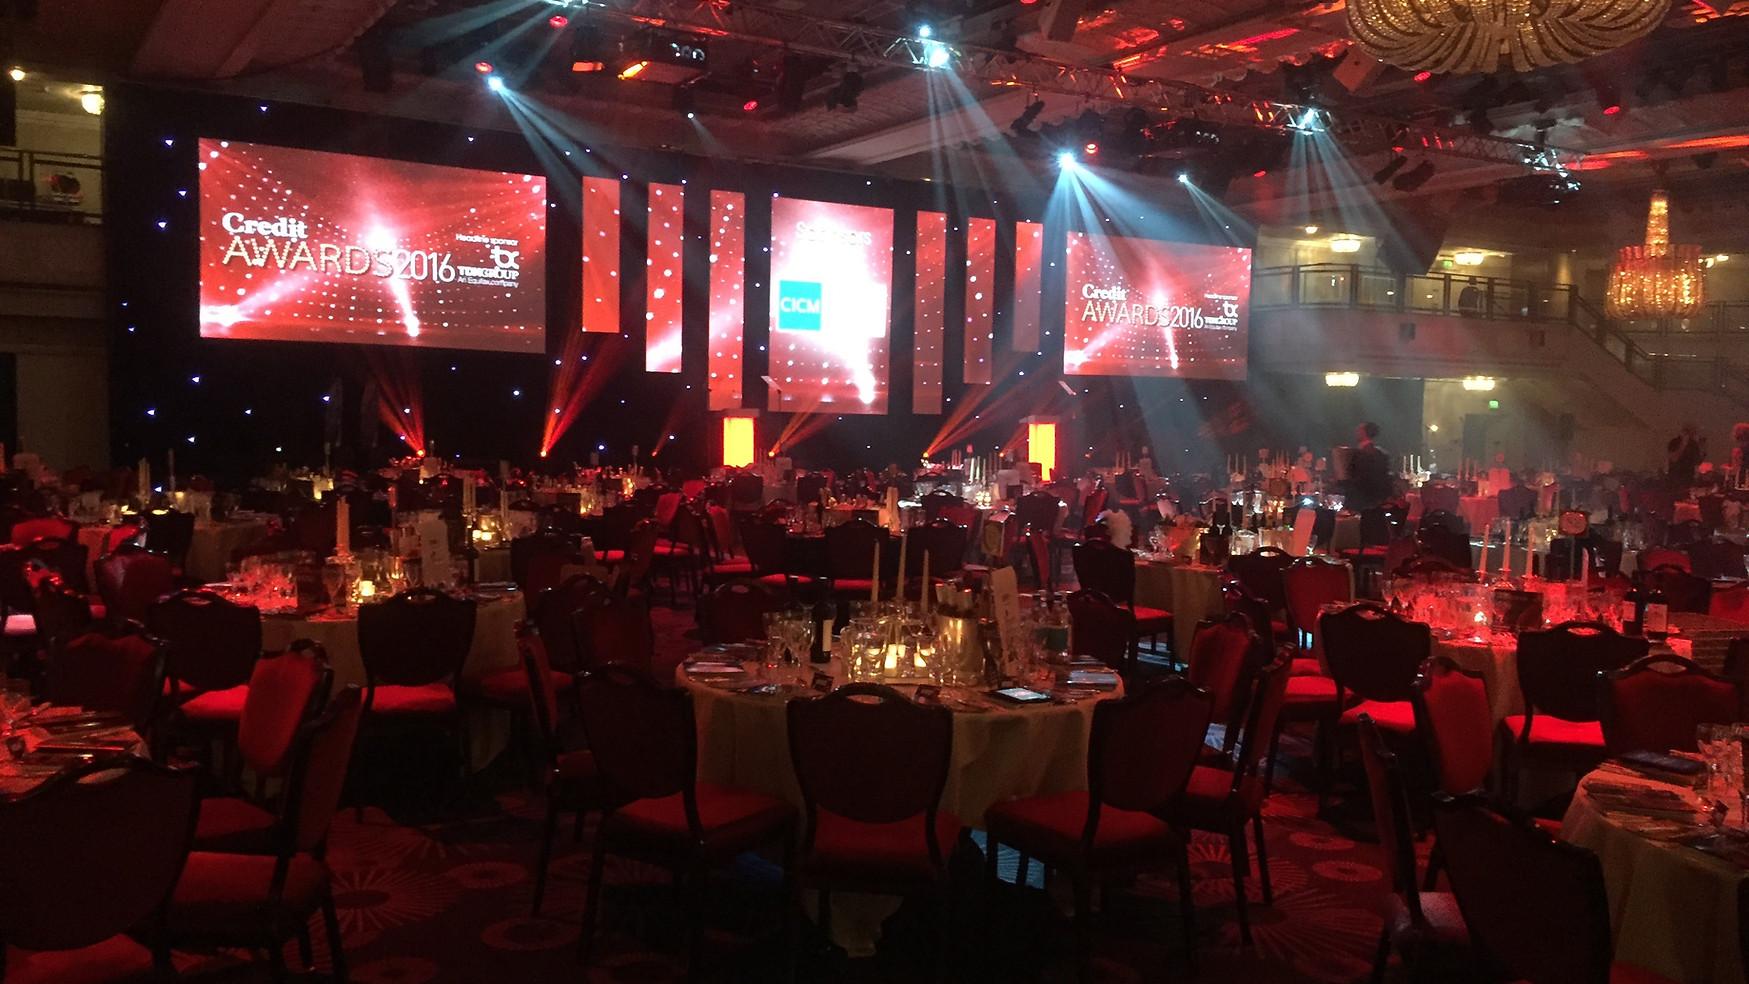 Awards Ceremony - 2016